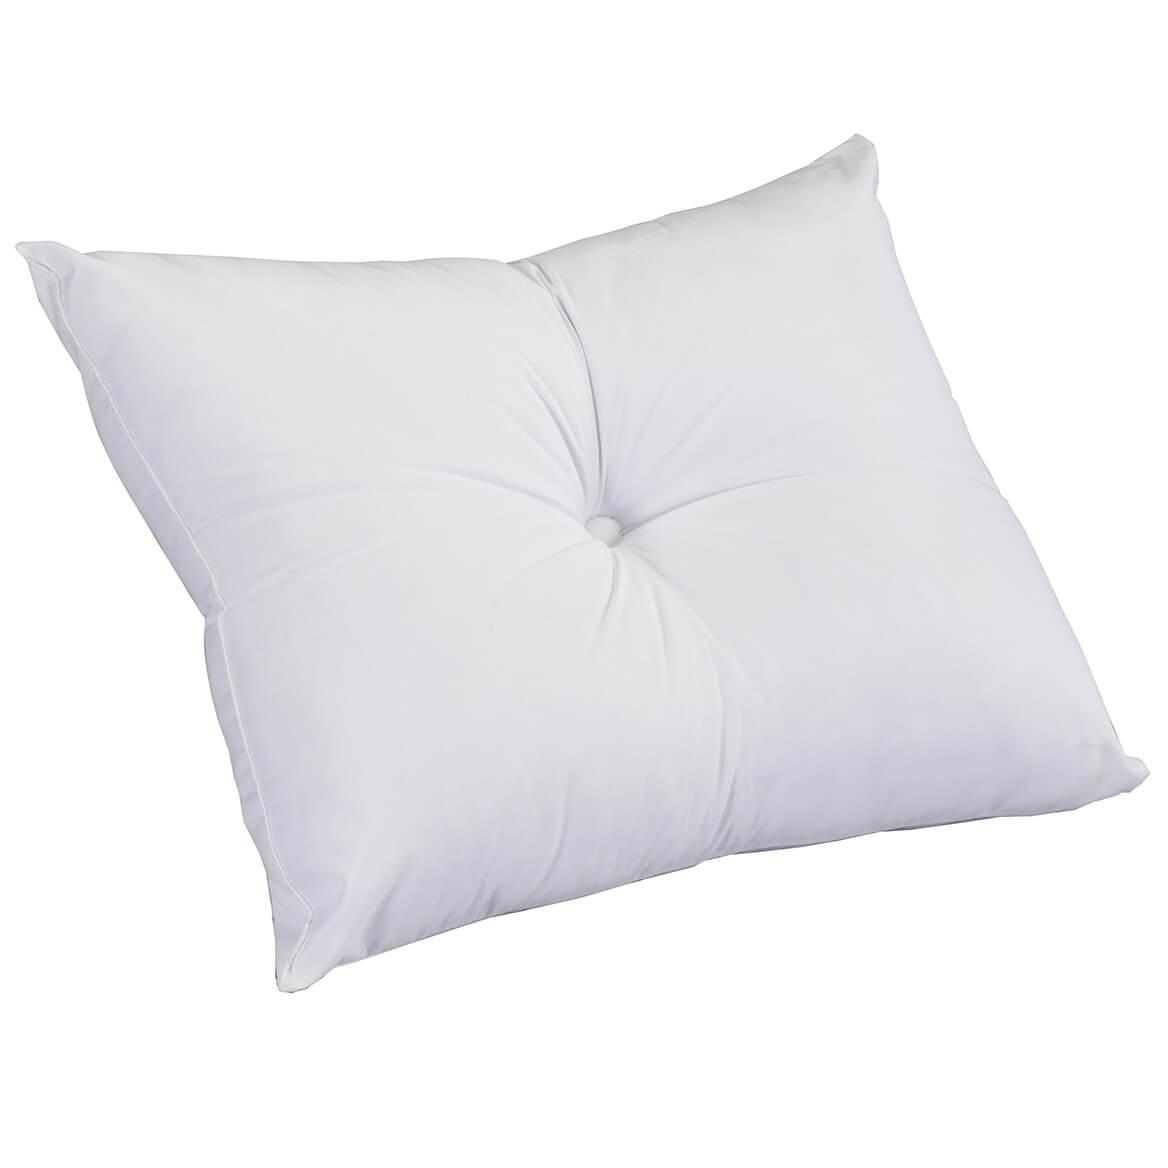 Sleepy Hollow Anti-Stress Pillow